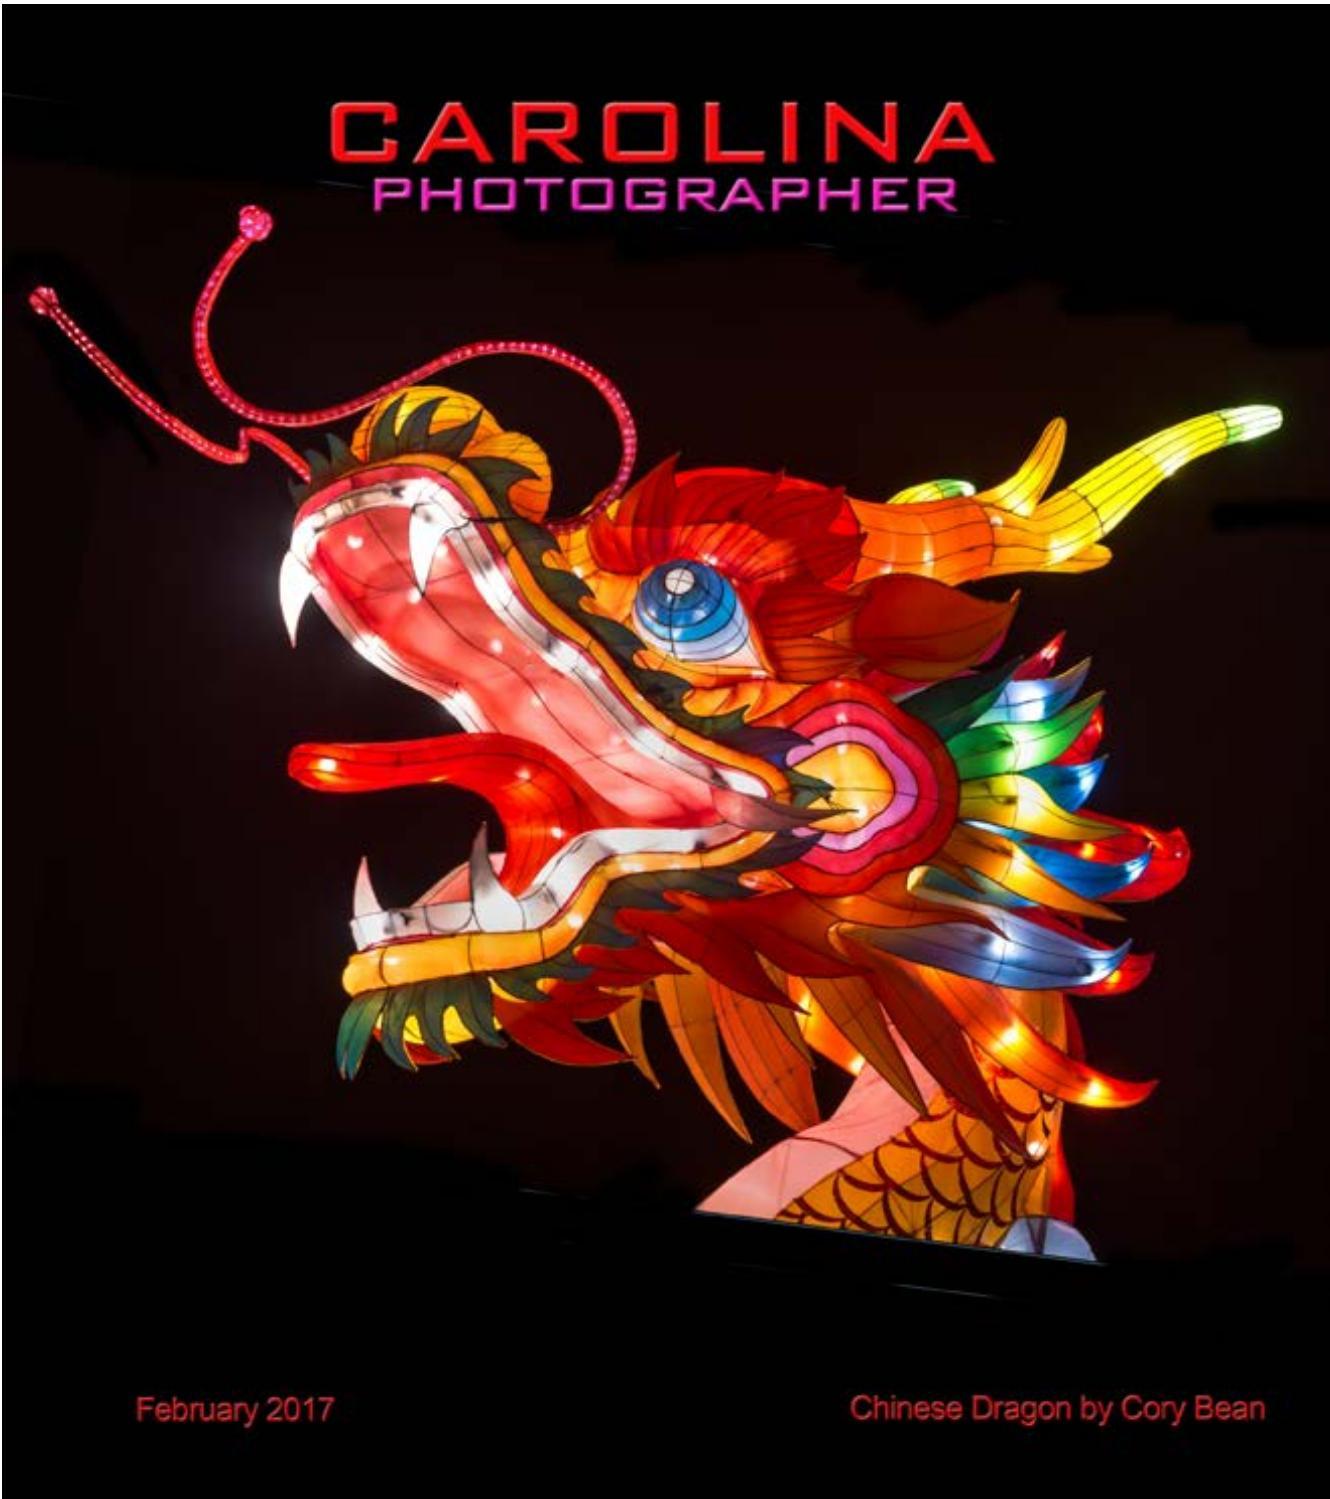 February 2017 Issue Of Carolina Photographer By Fuller